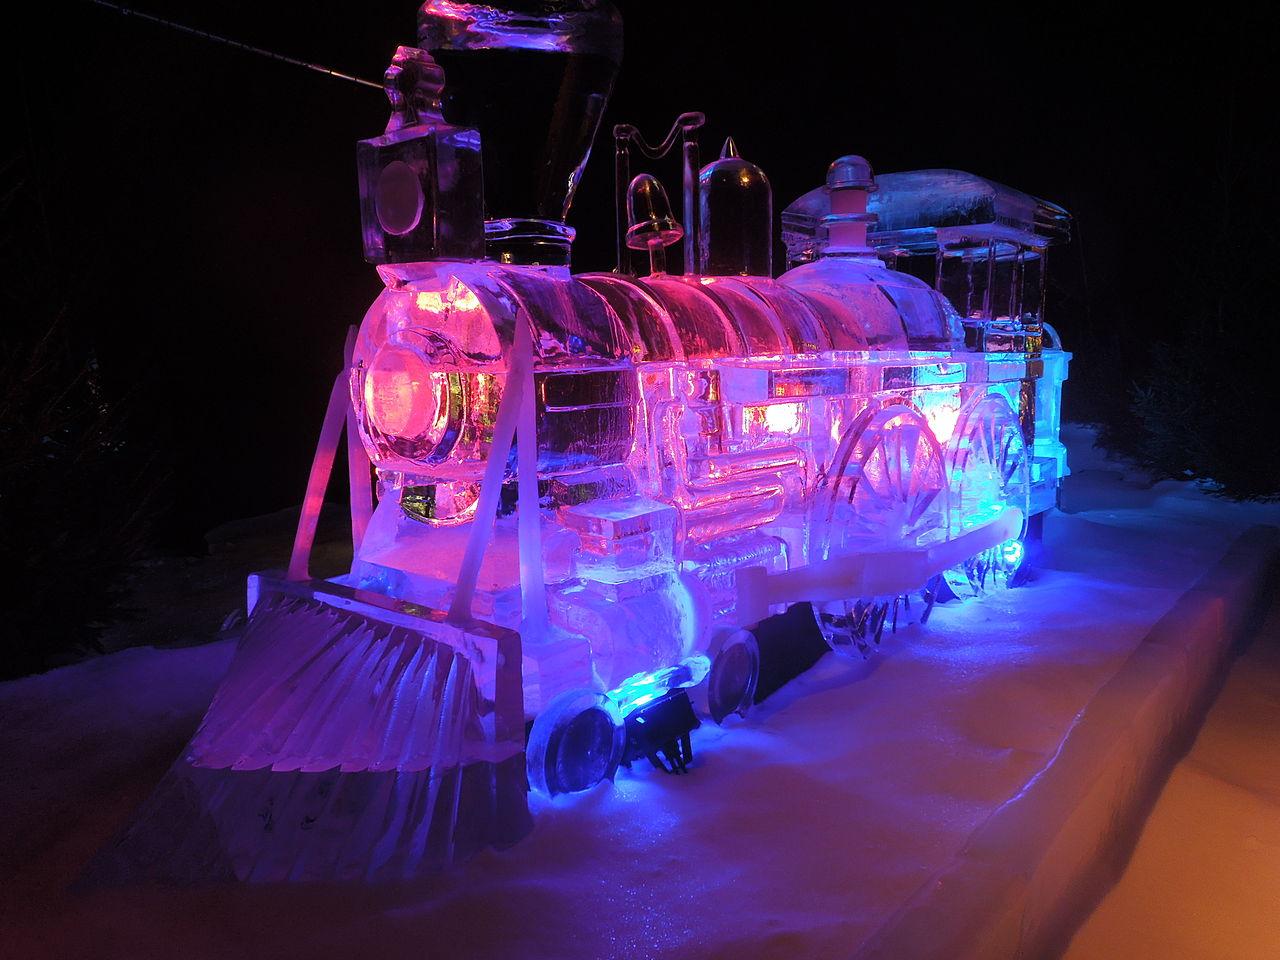 ice_sculpture_train